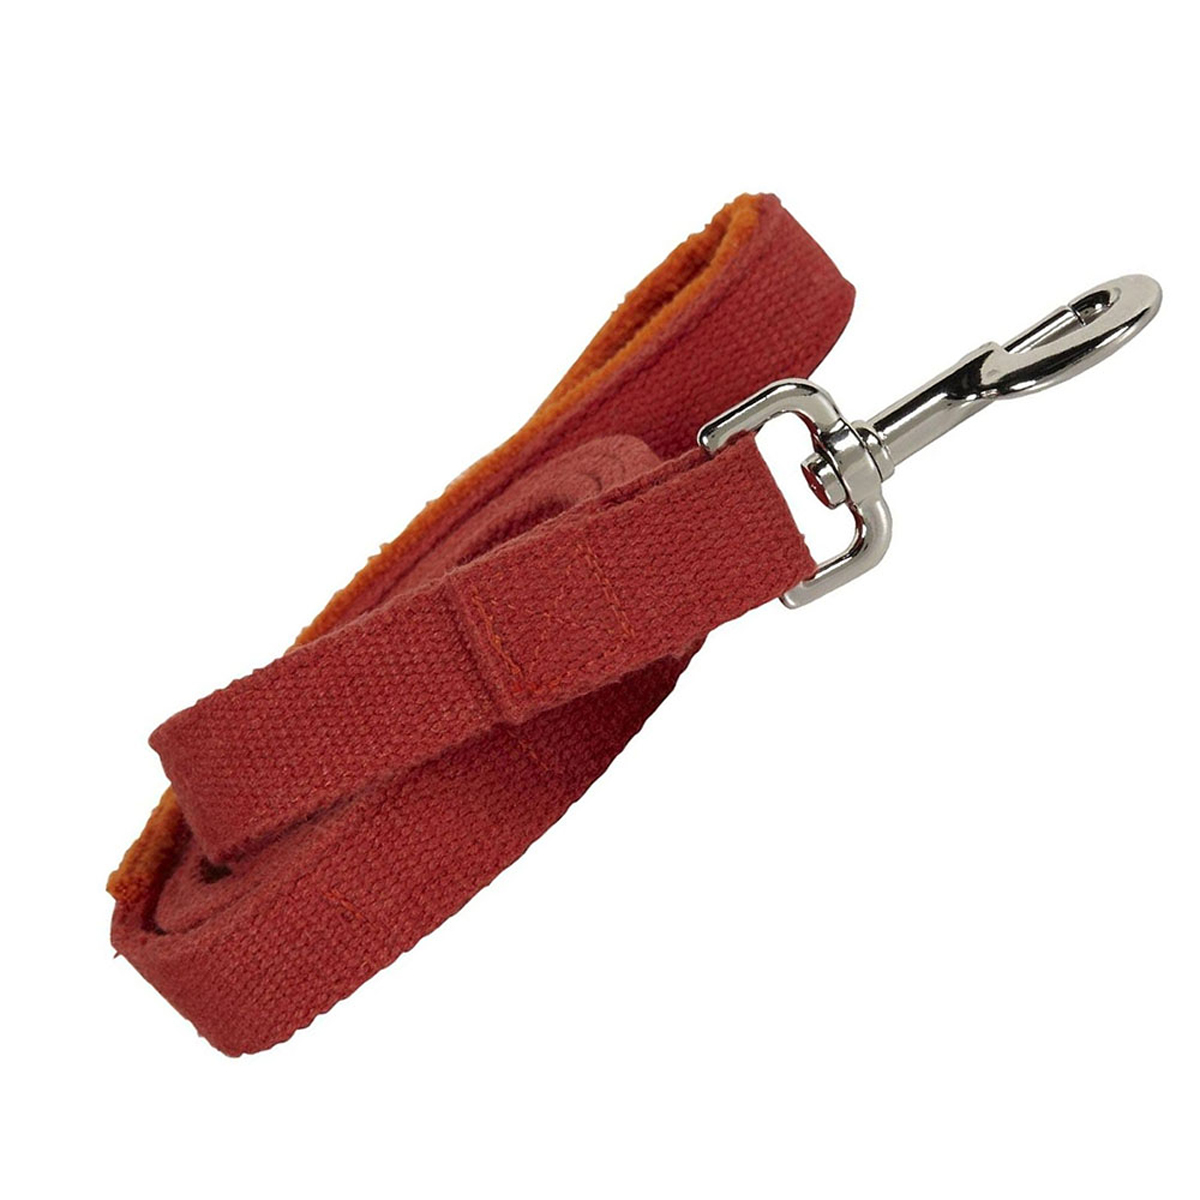 Communication on this topic: Planet Dog Hemp Dog Leash with Fleece-Lined , planet-dog-hemp-dog-leash-with-fleece-lined/